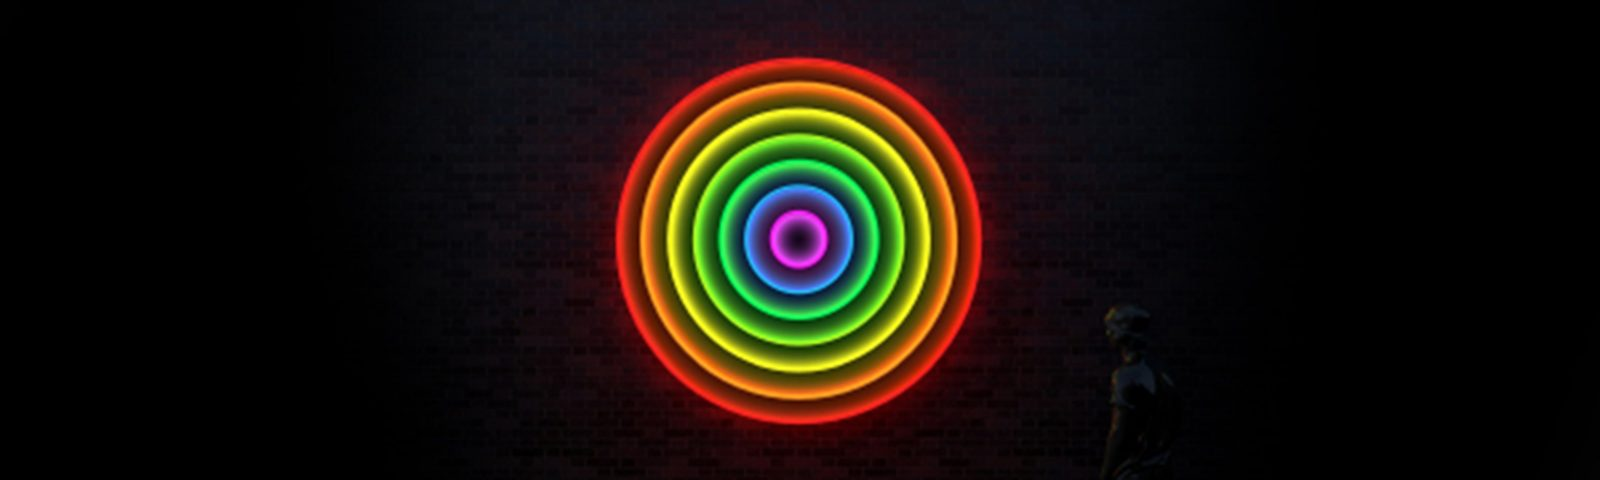 CIRCLE, Artist - John Fish